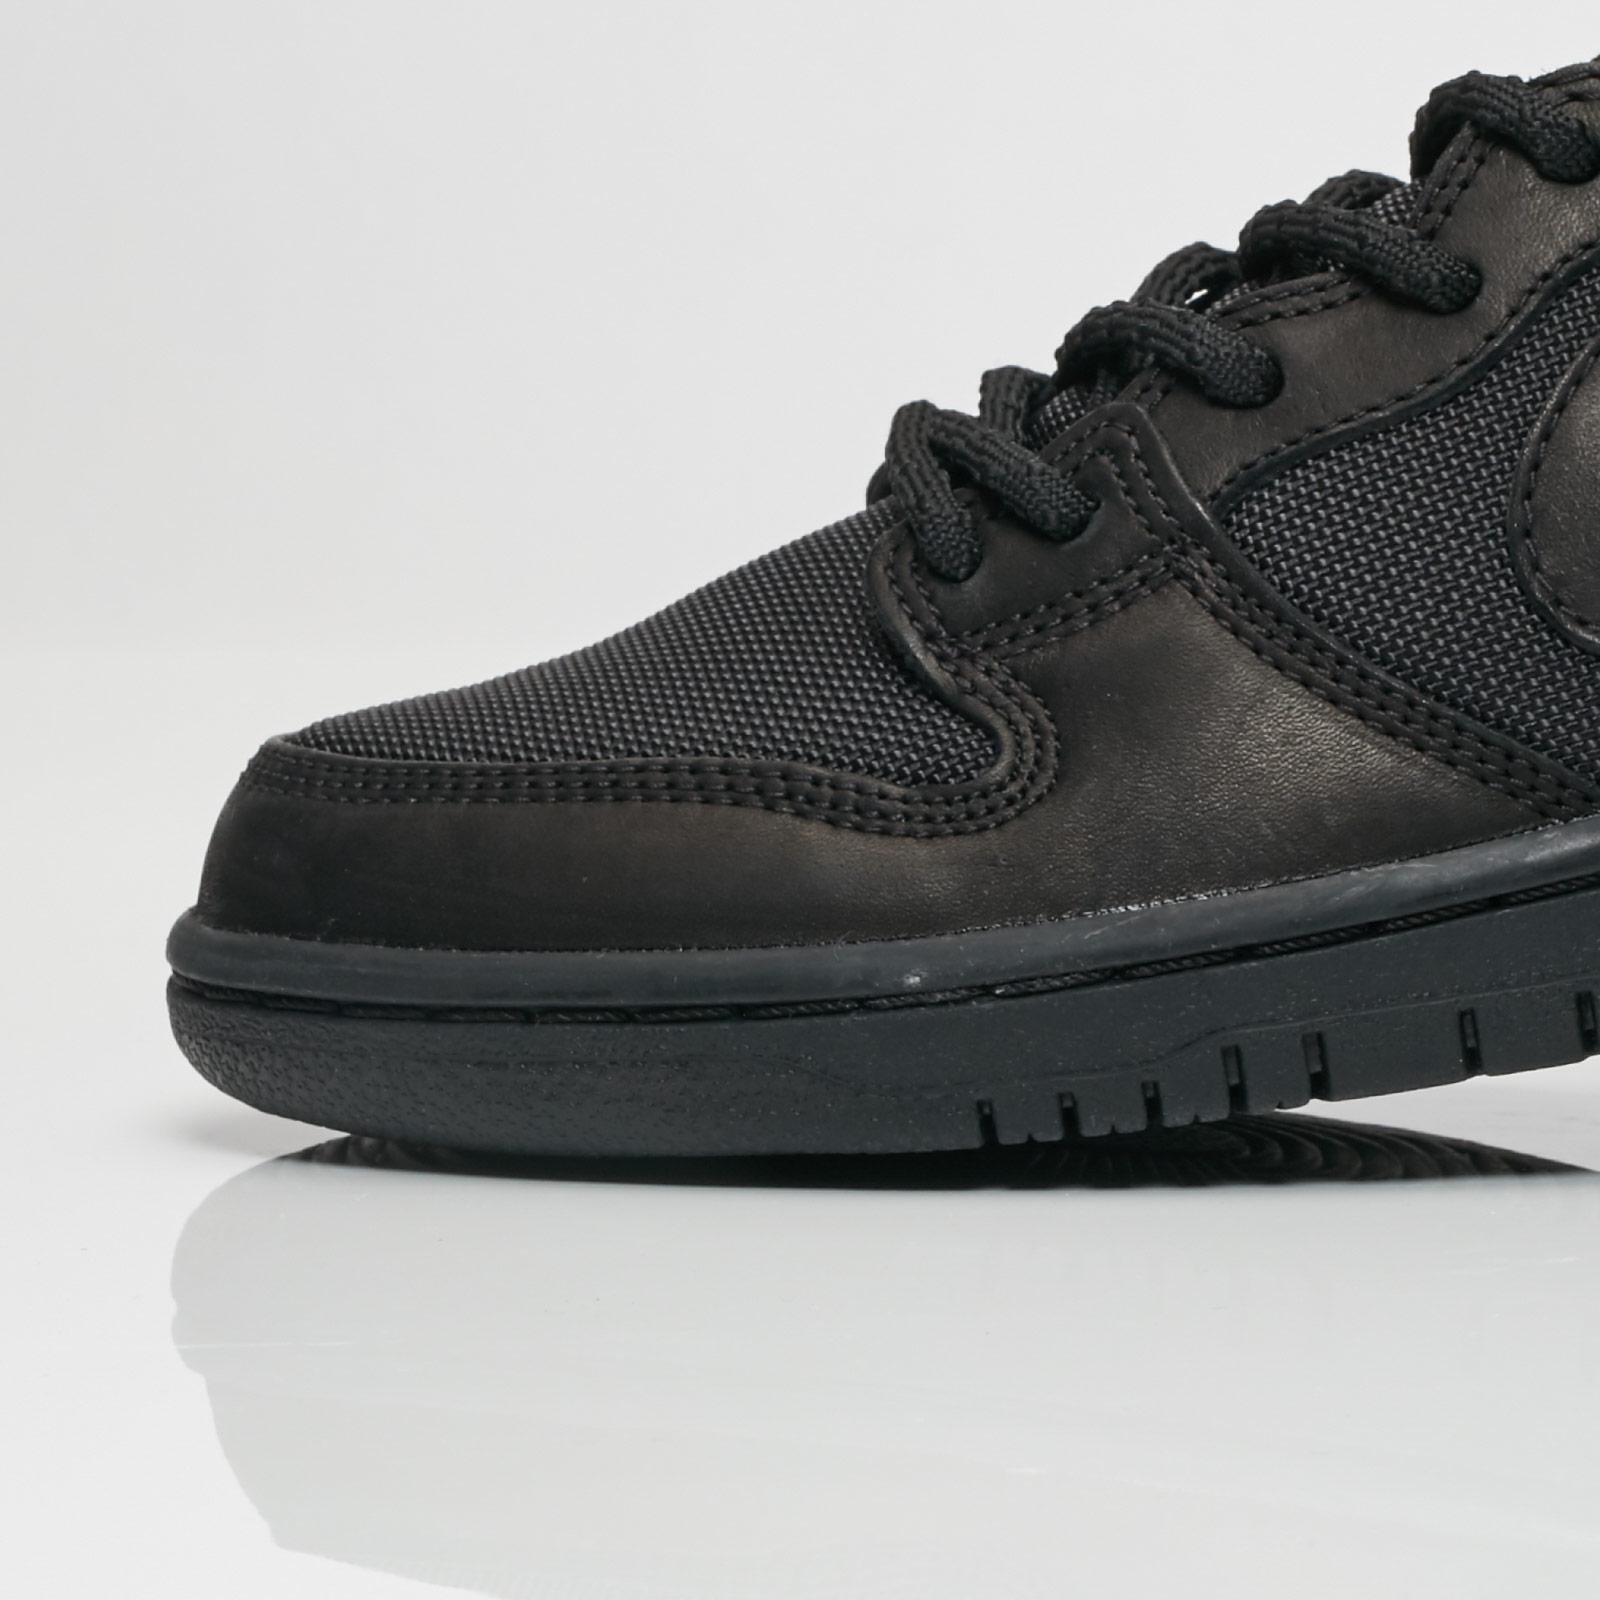 size 40 91470 70950 Nike Zoom Dunk Hi Pro BOTA - 923110-001 - Sneakersnstuff | sneakers ...